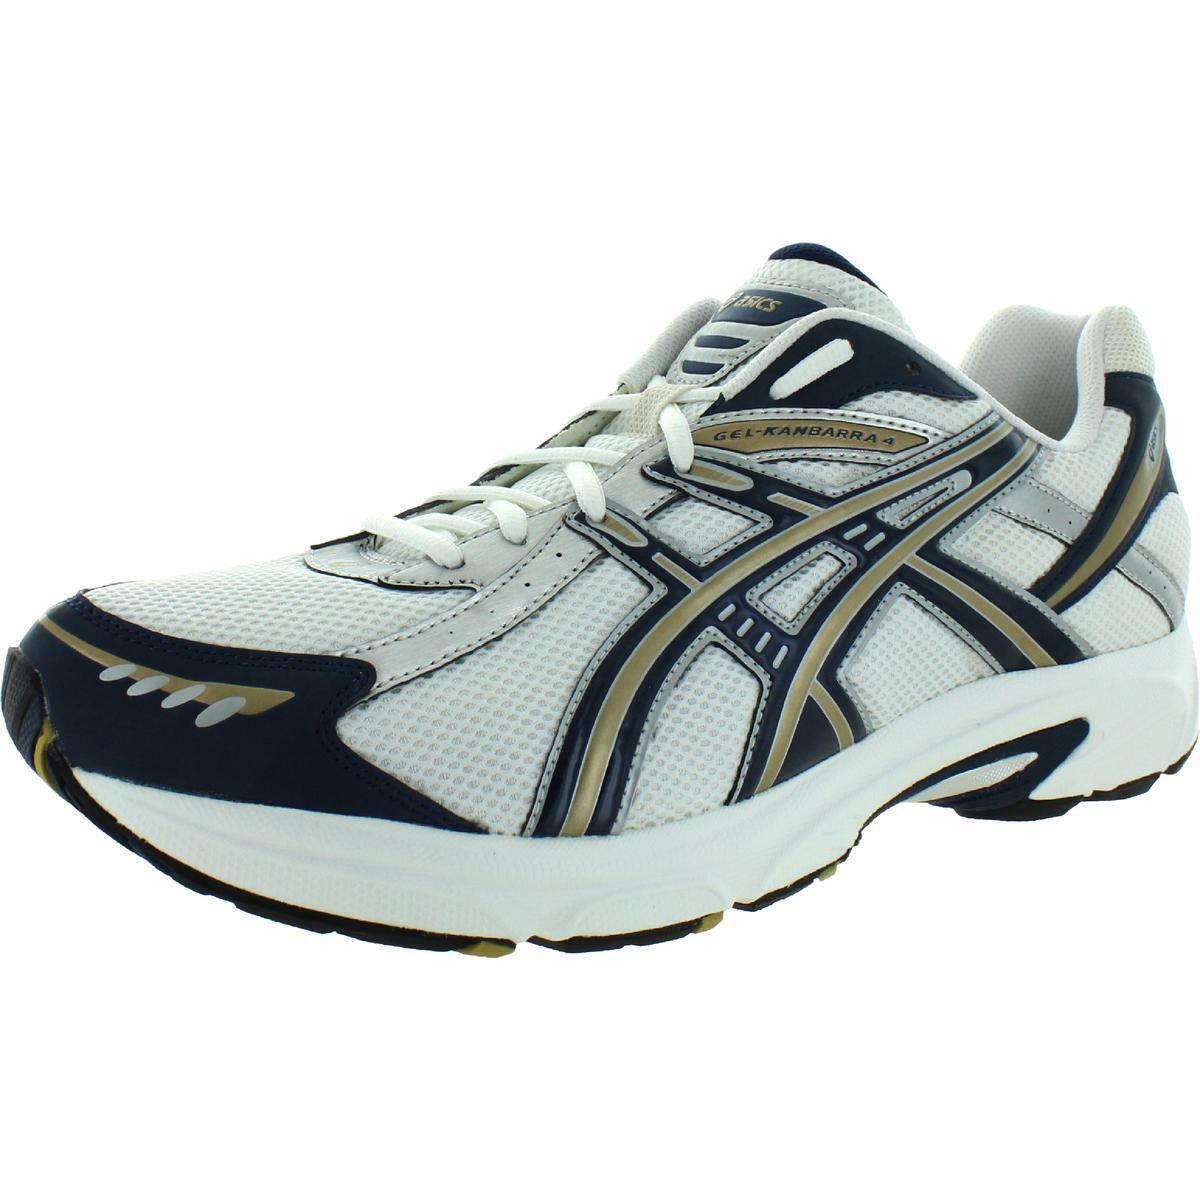 Cross Training Shoes Sneakers BHFO 0467